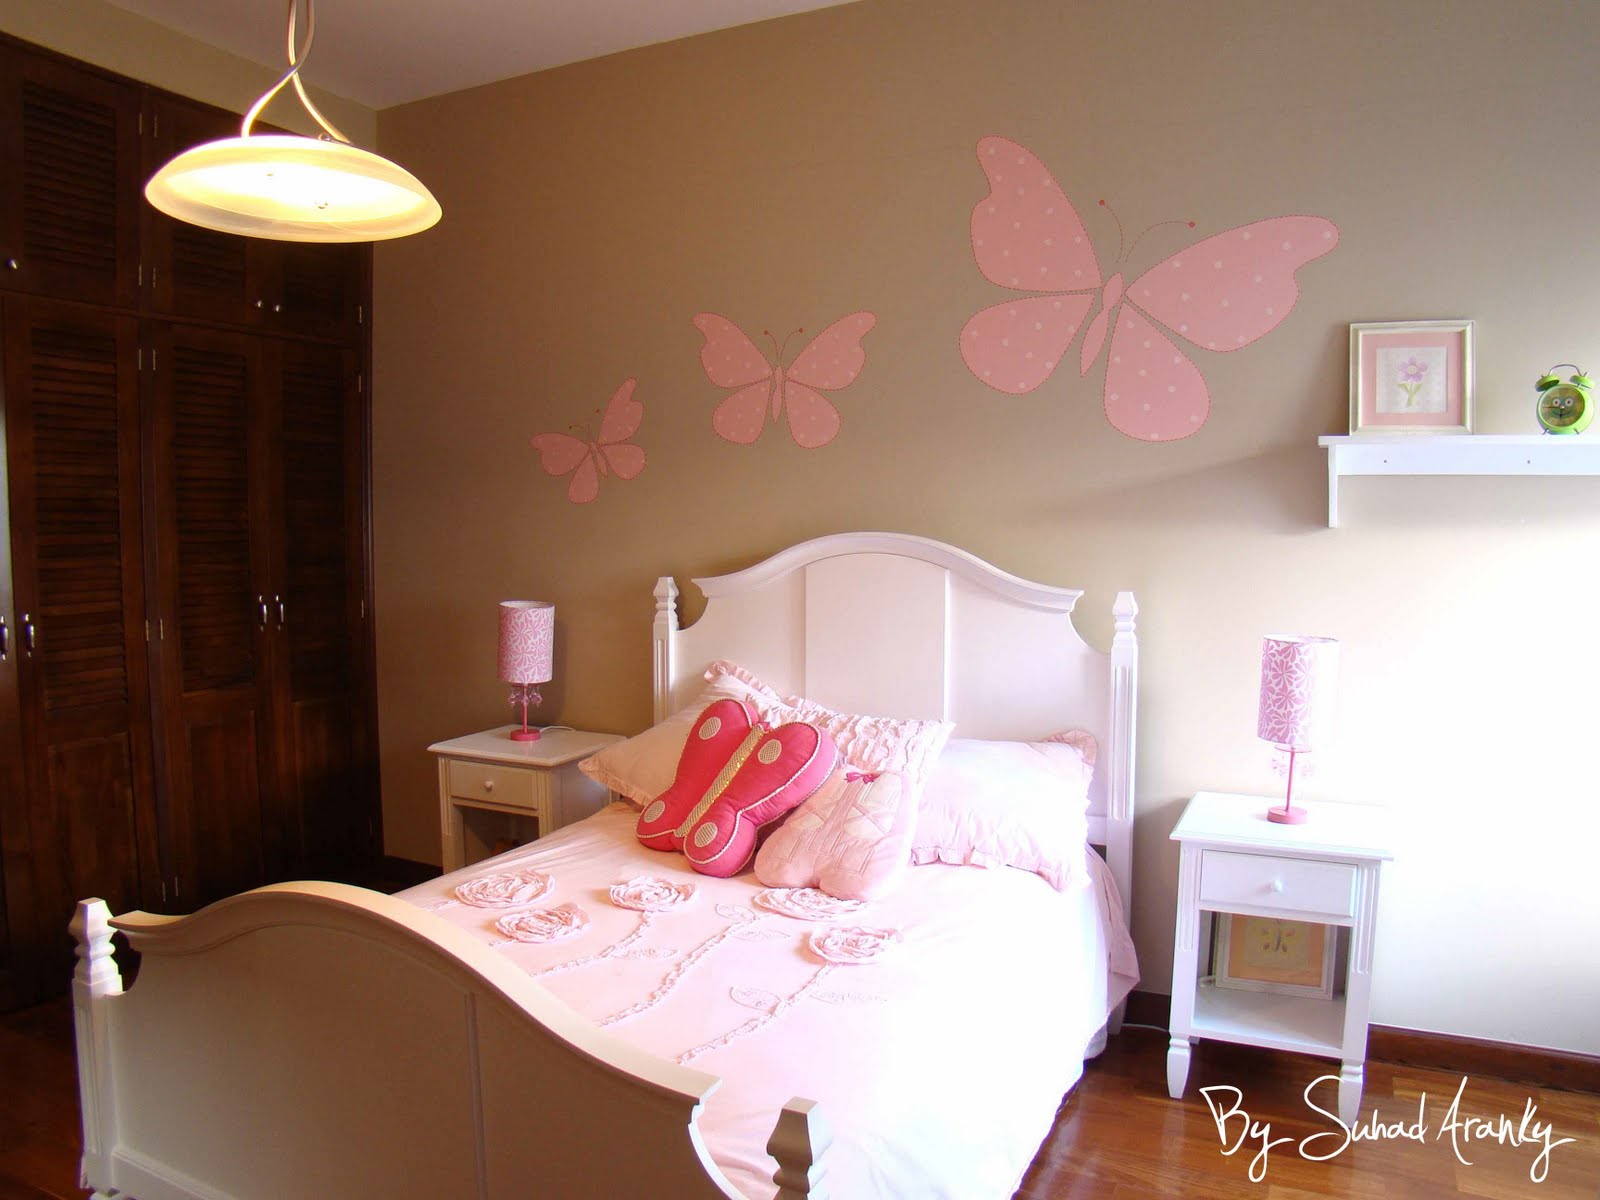 Murales con mariposas imagui - Murales para ninas ...